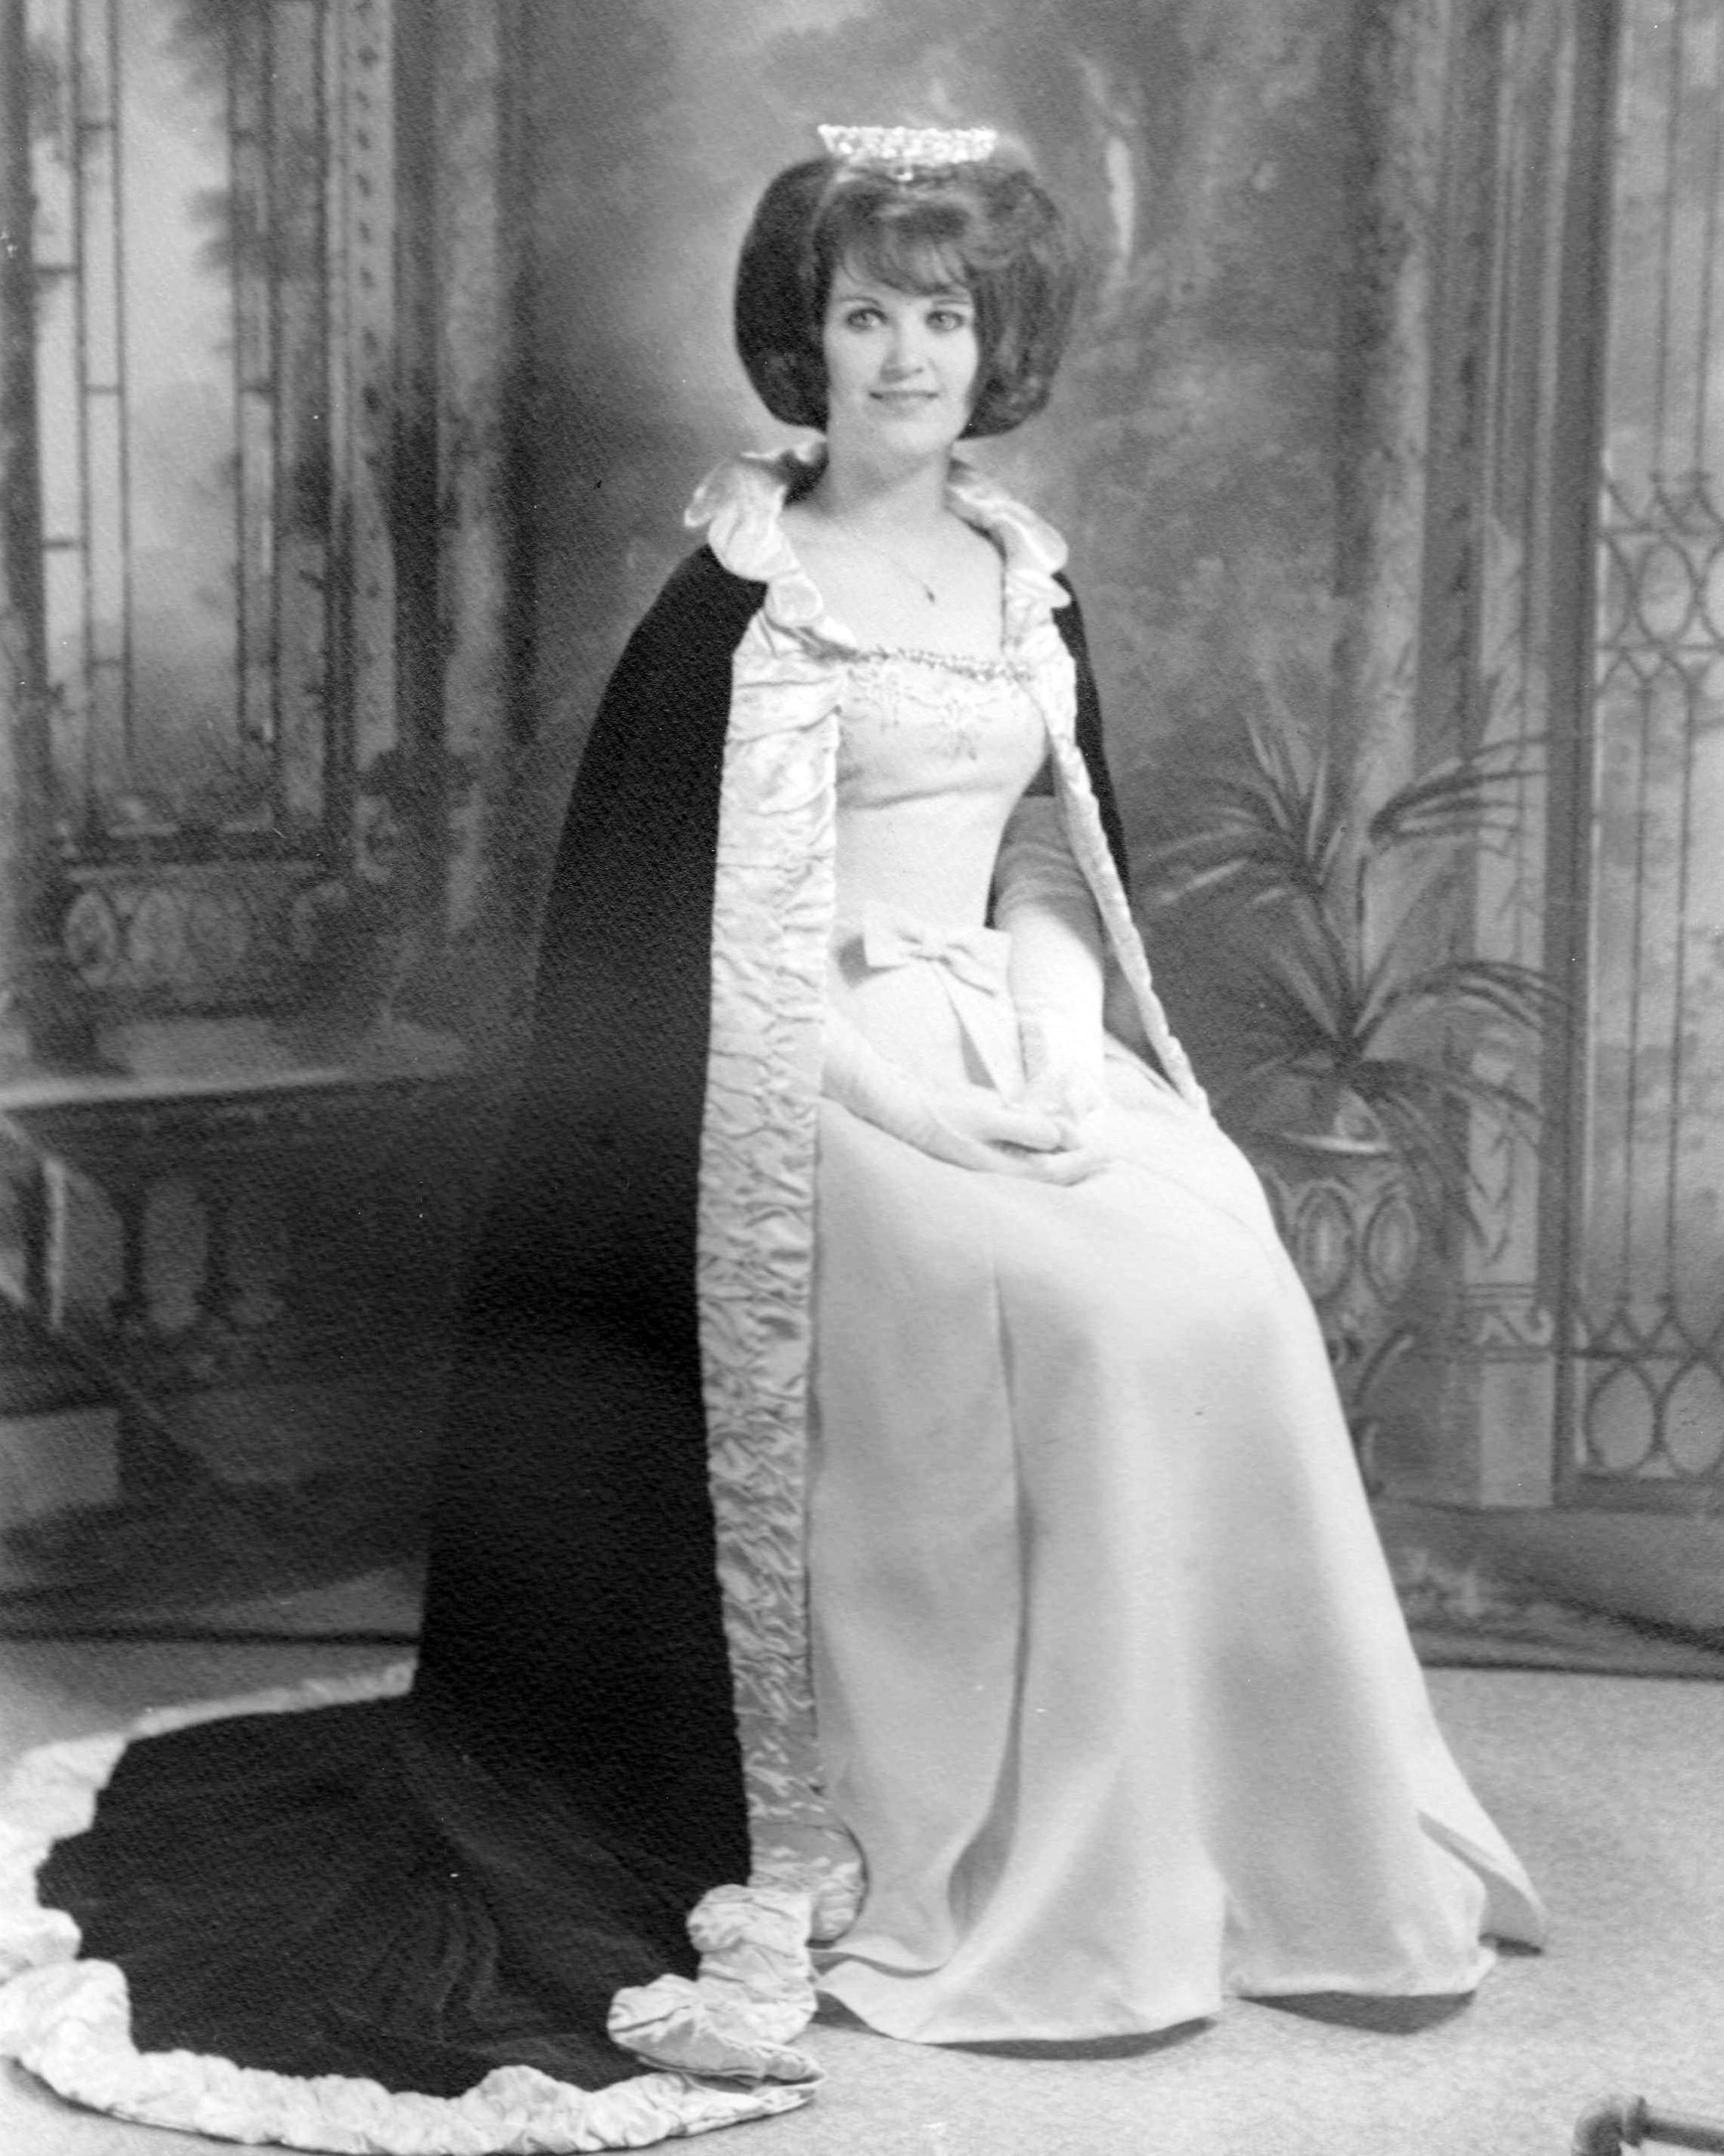 Cathy Adkins Barley - Miss Buna 1965